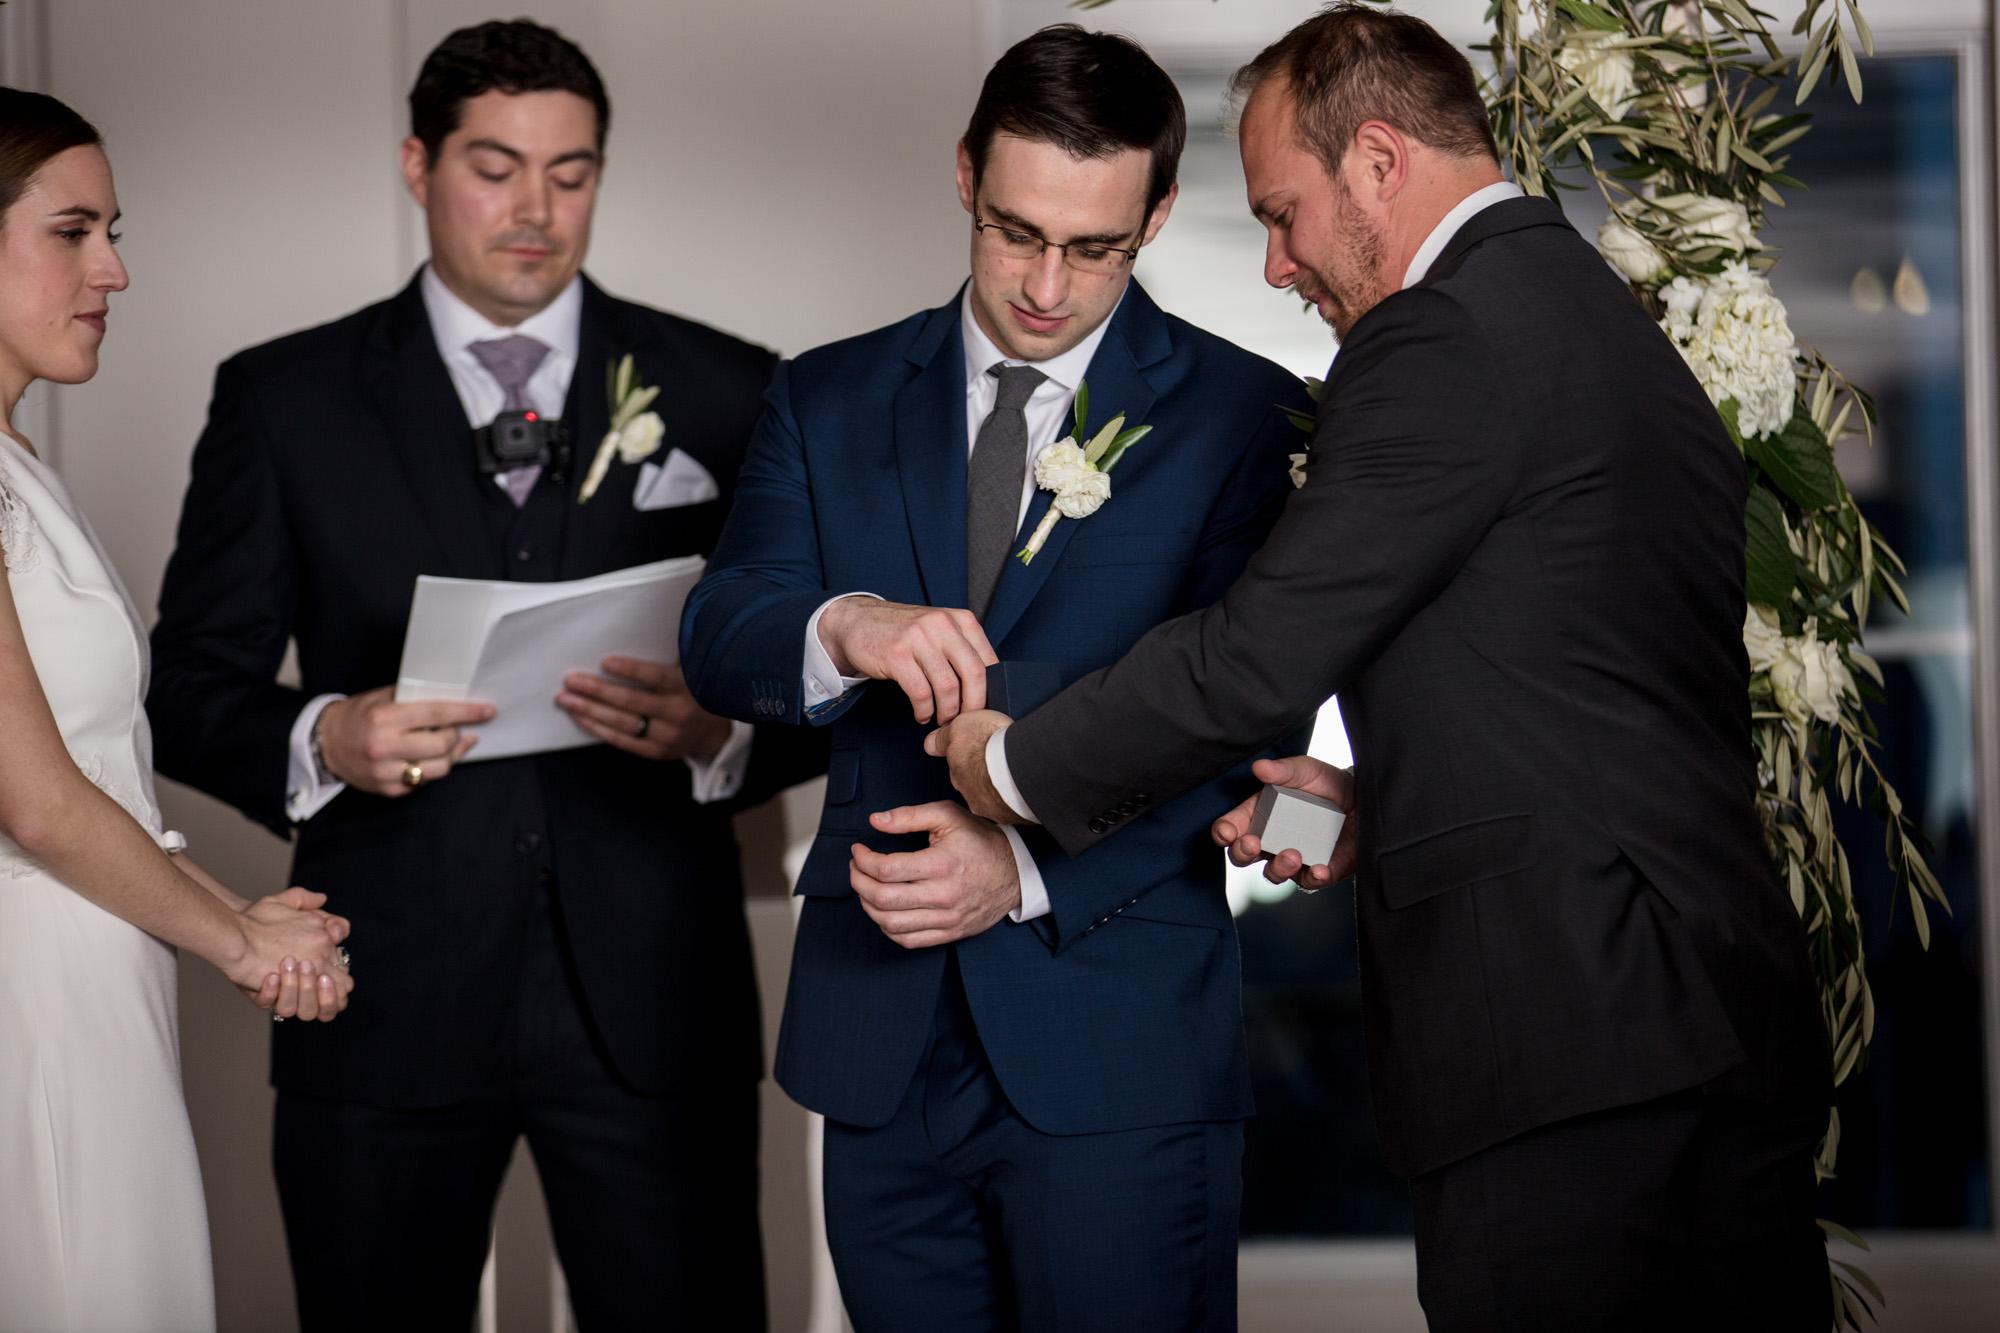 nj-wedding-photographer-maritime-parc-maria-david-42.jpg